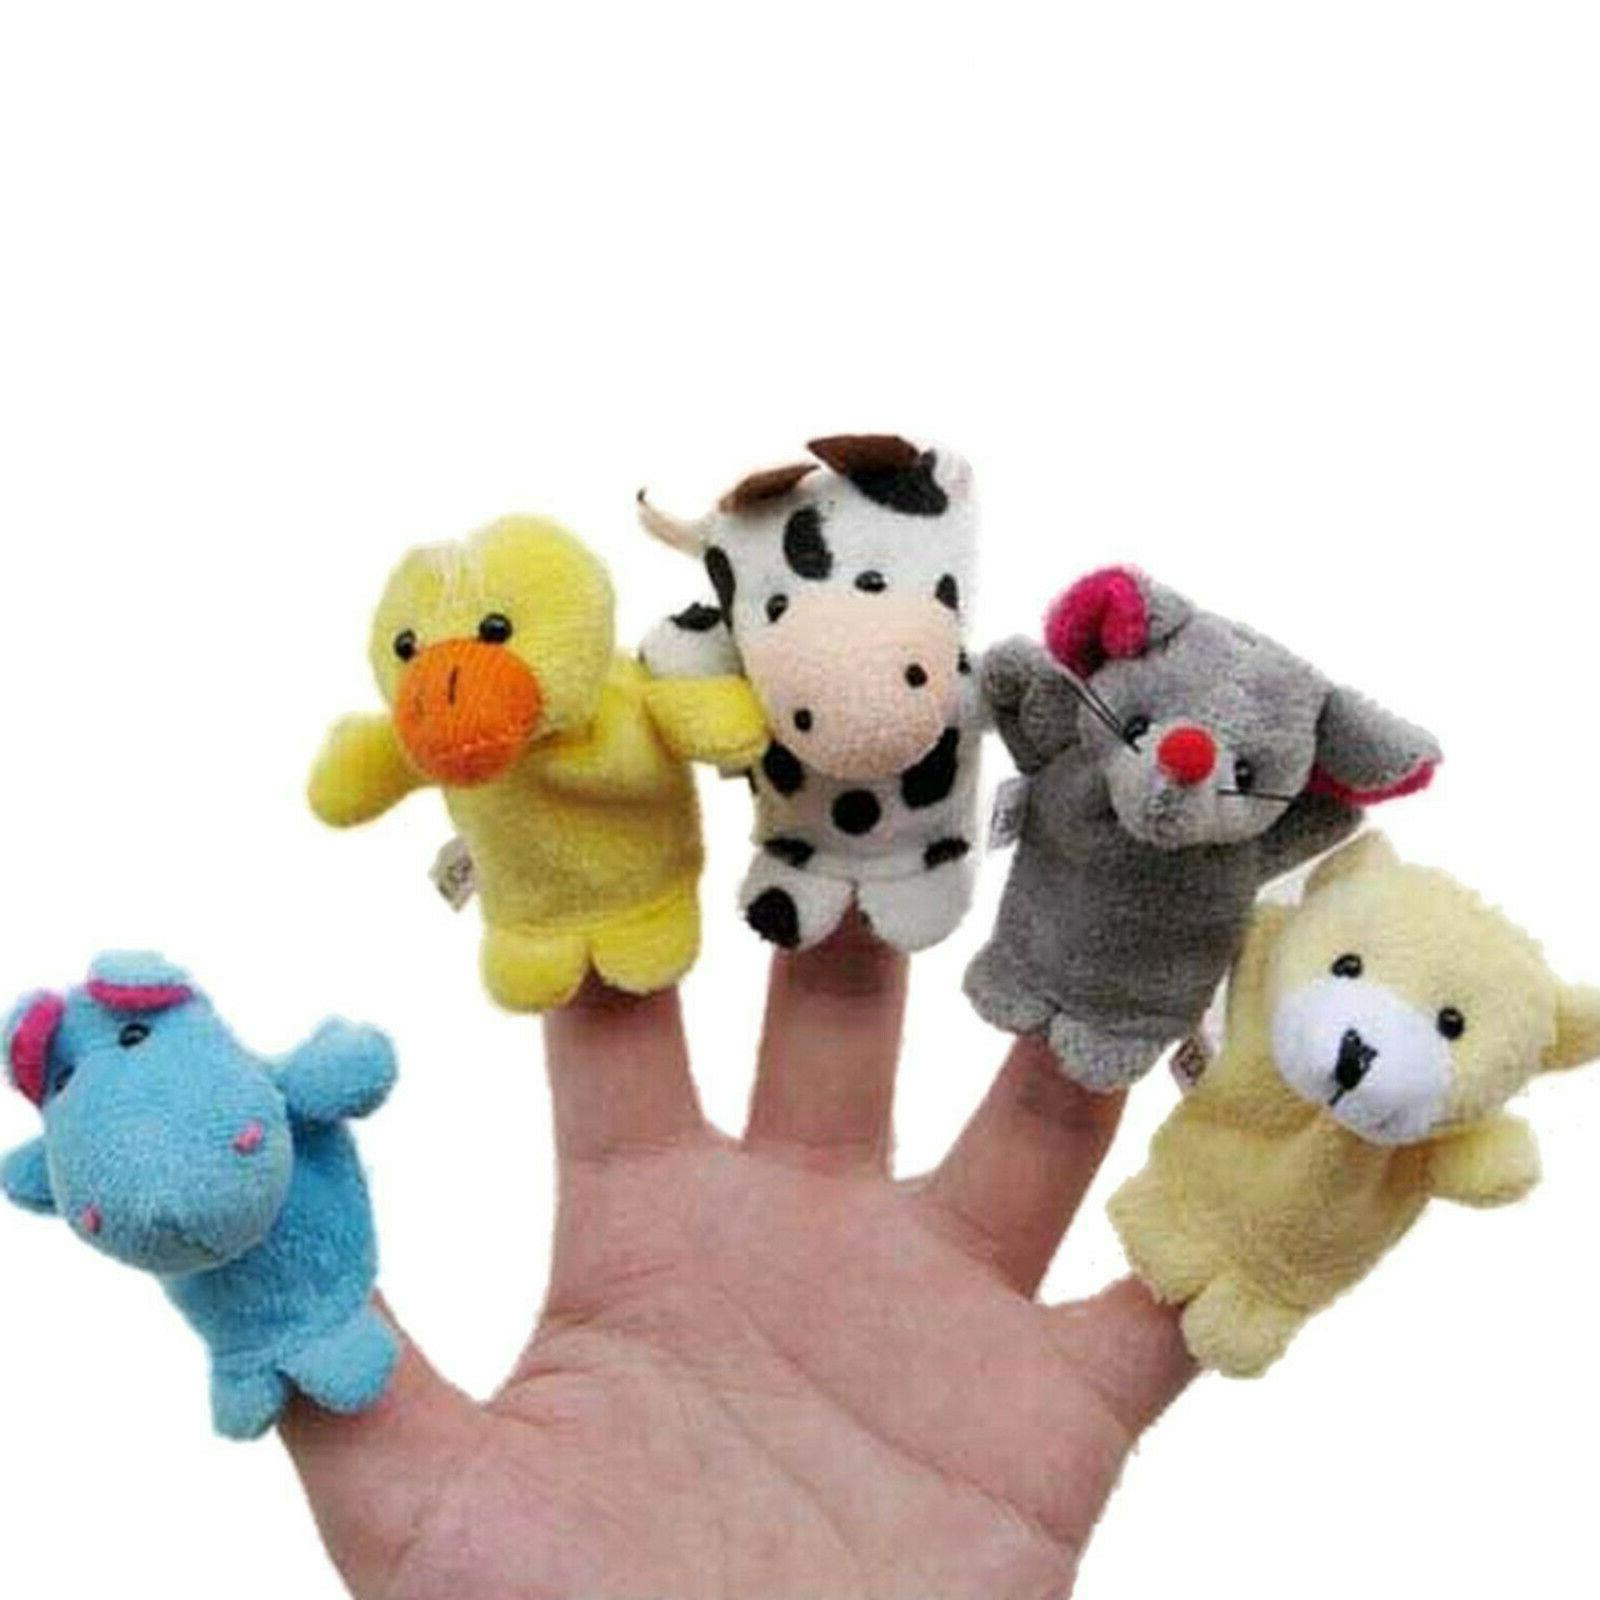 10PCS/set Cartoon Finger Puppets Baby New